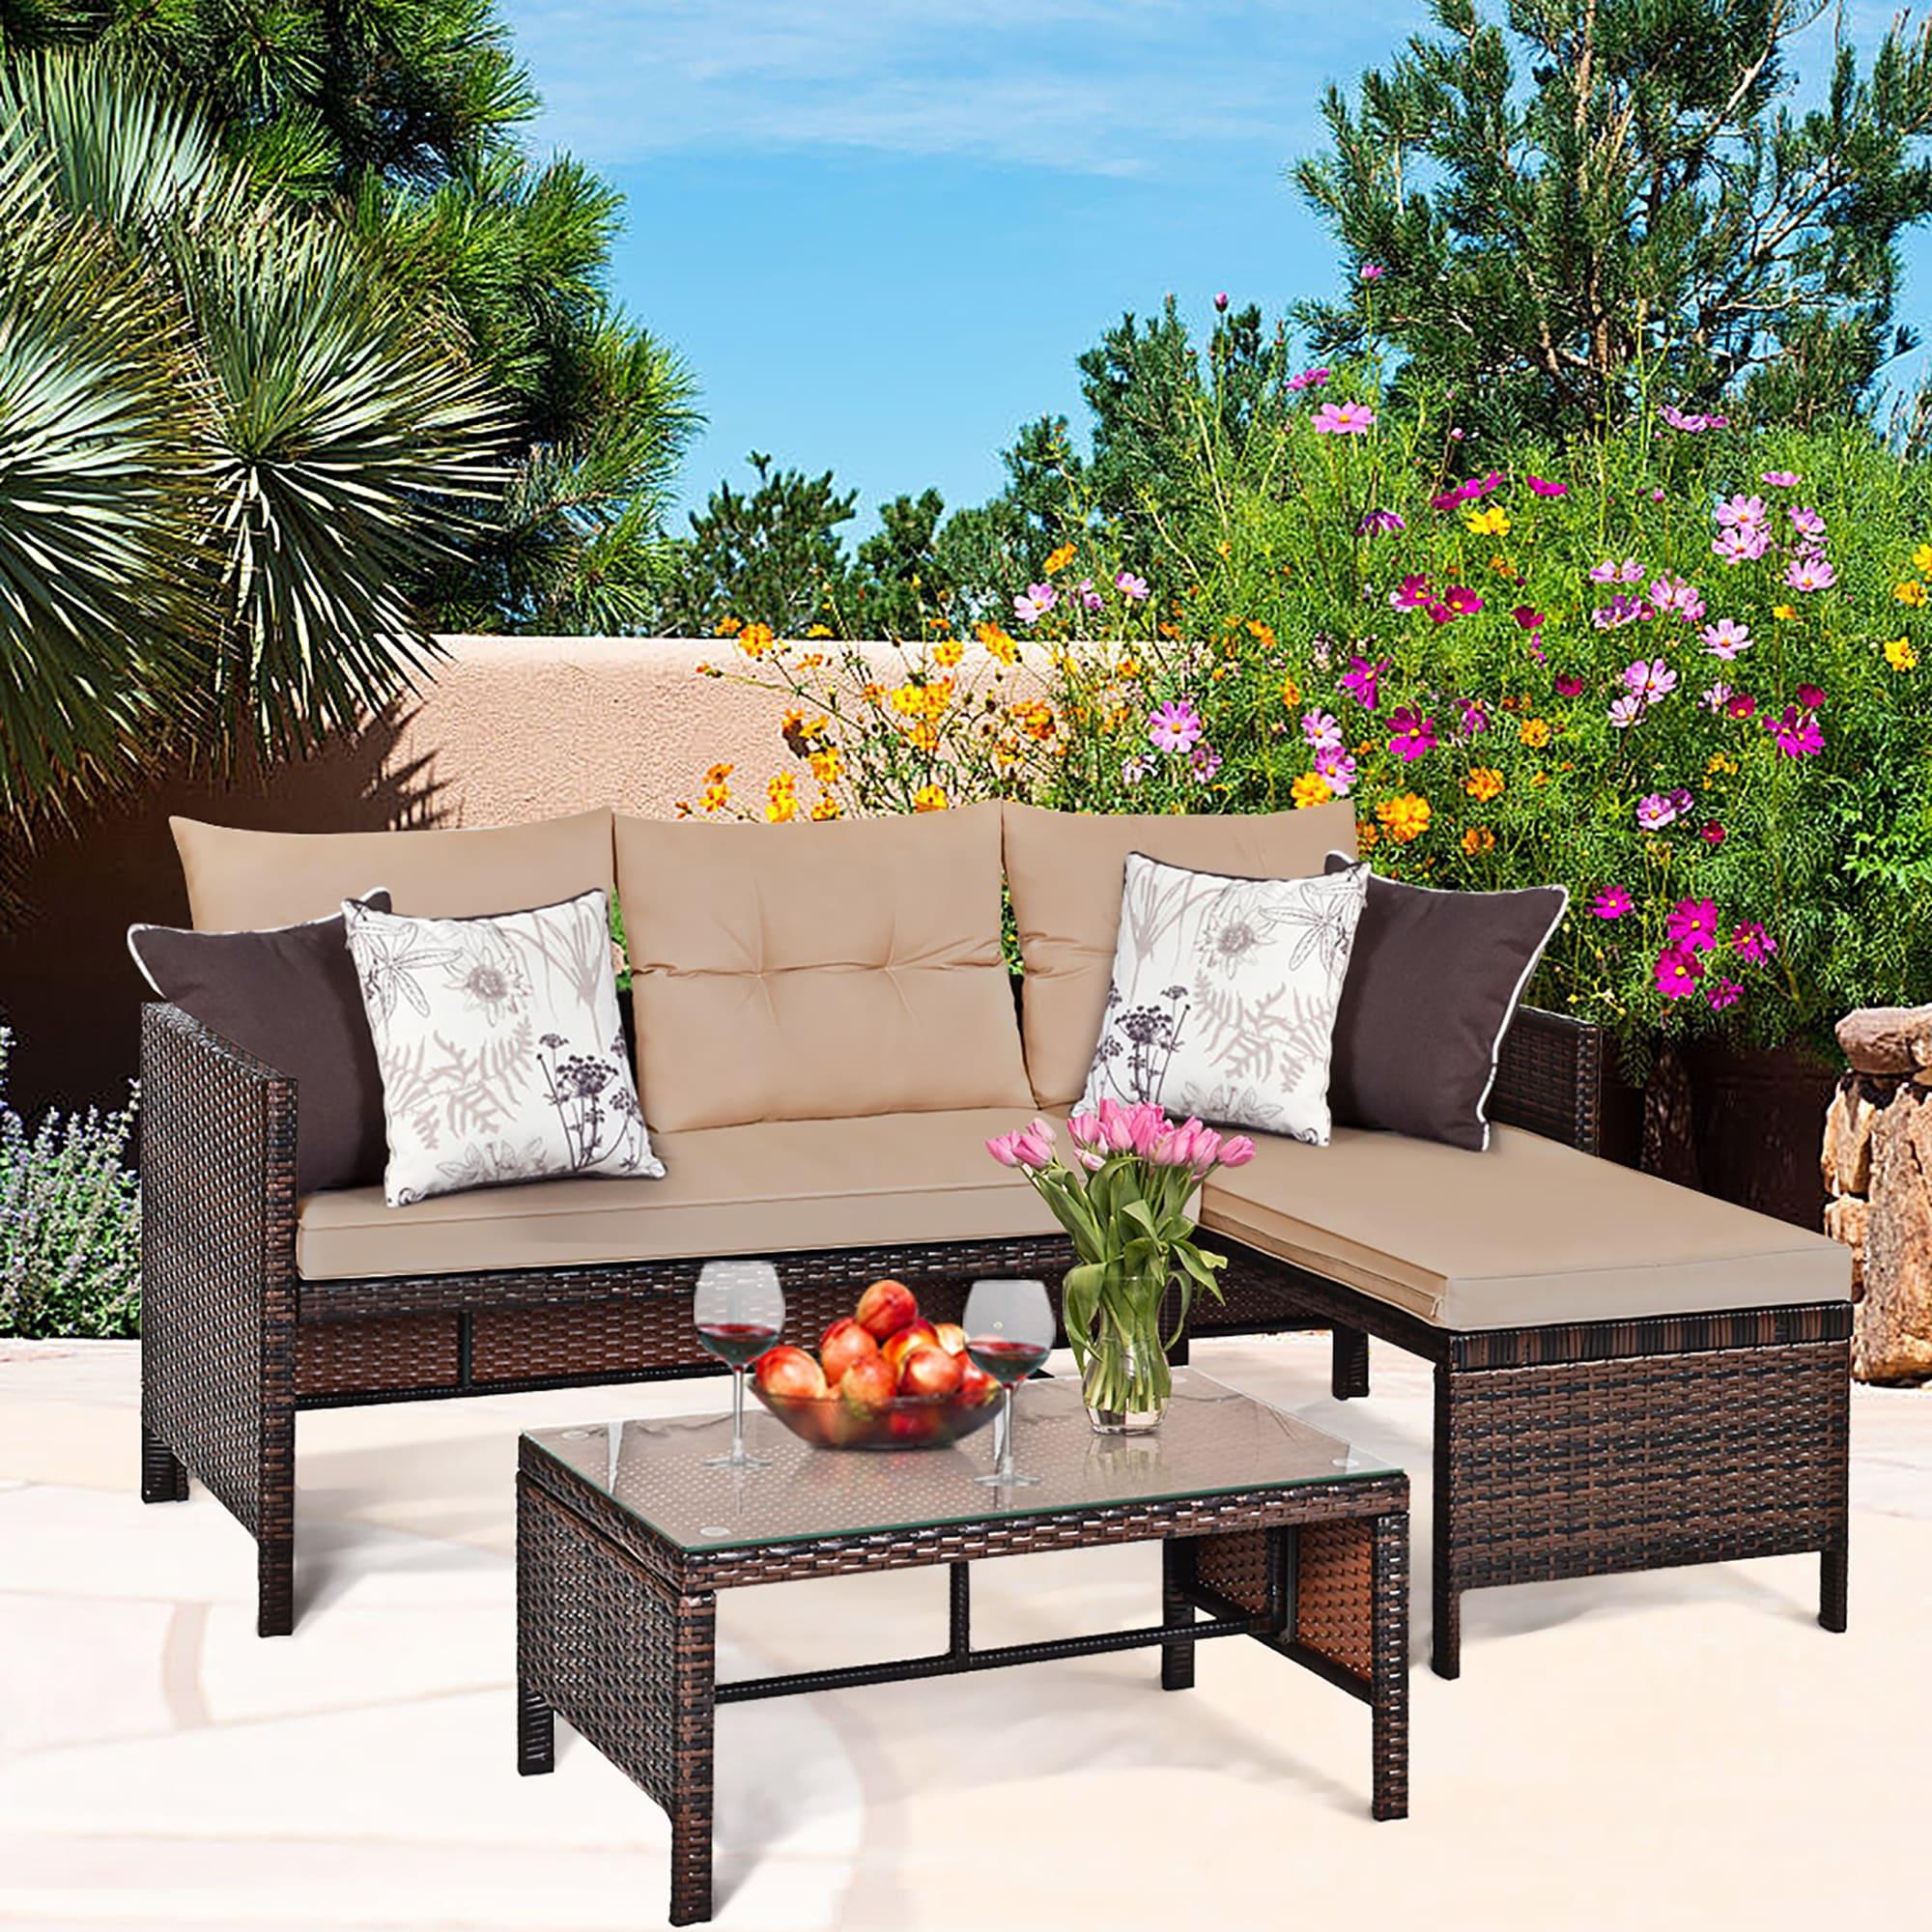 Image of: Shop Black Friday Deals On Costway 3pcs Patio Wicker Rattan Sofa Set Outdoor Sectional Overstock 16386651